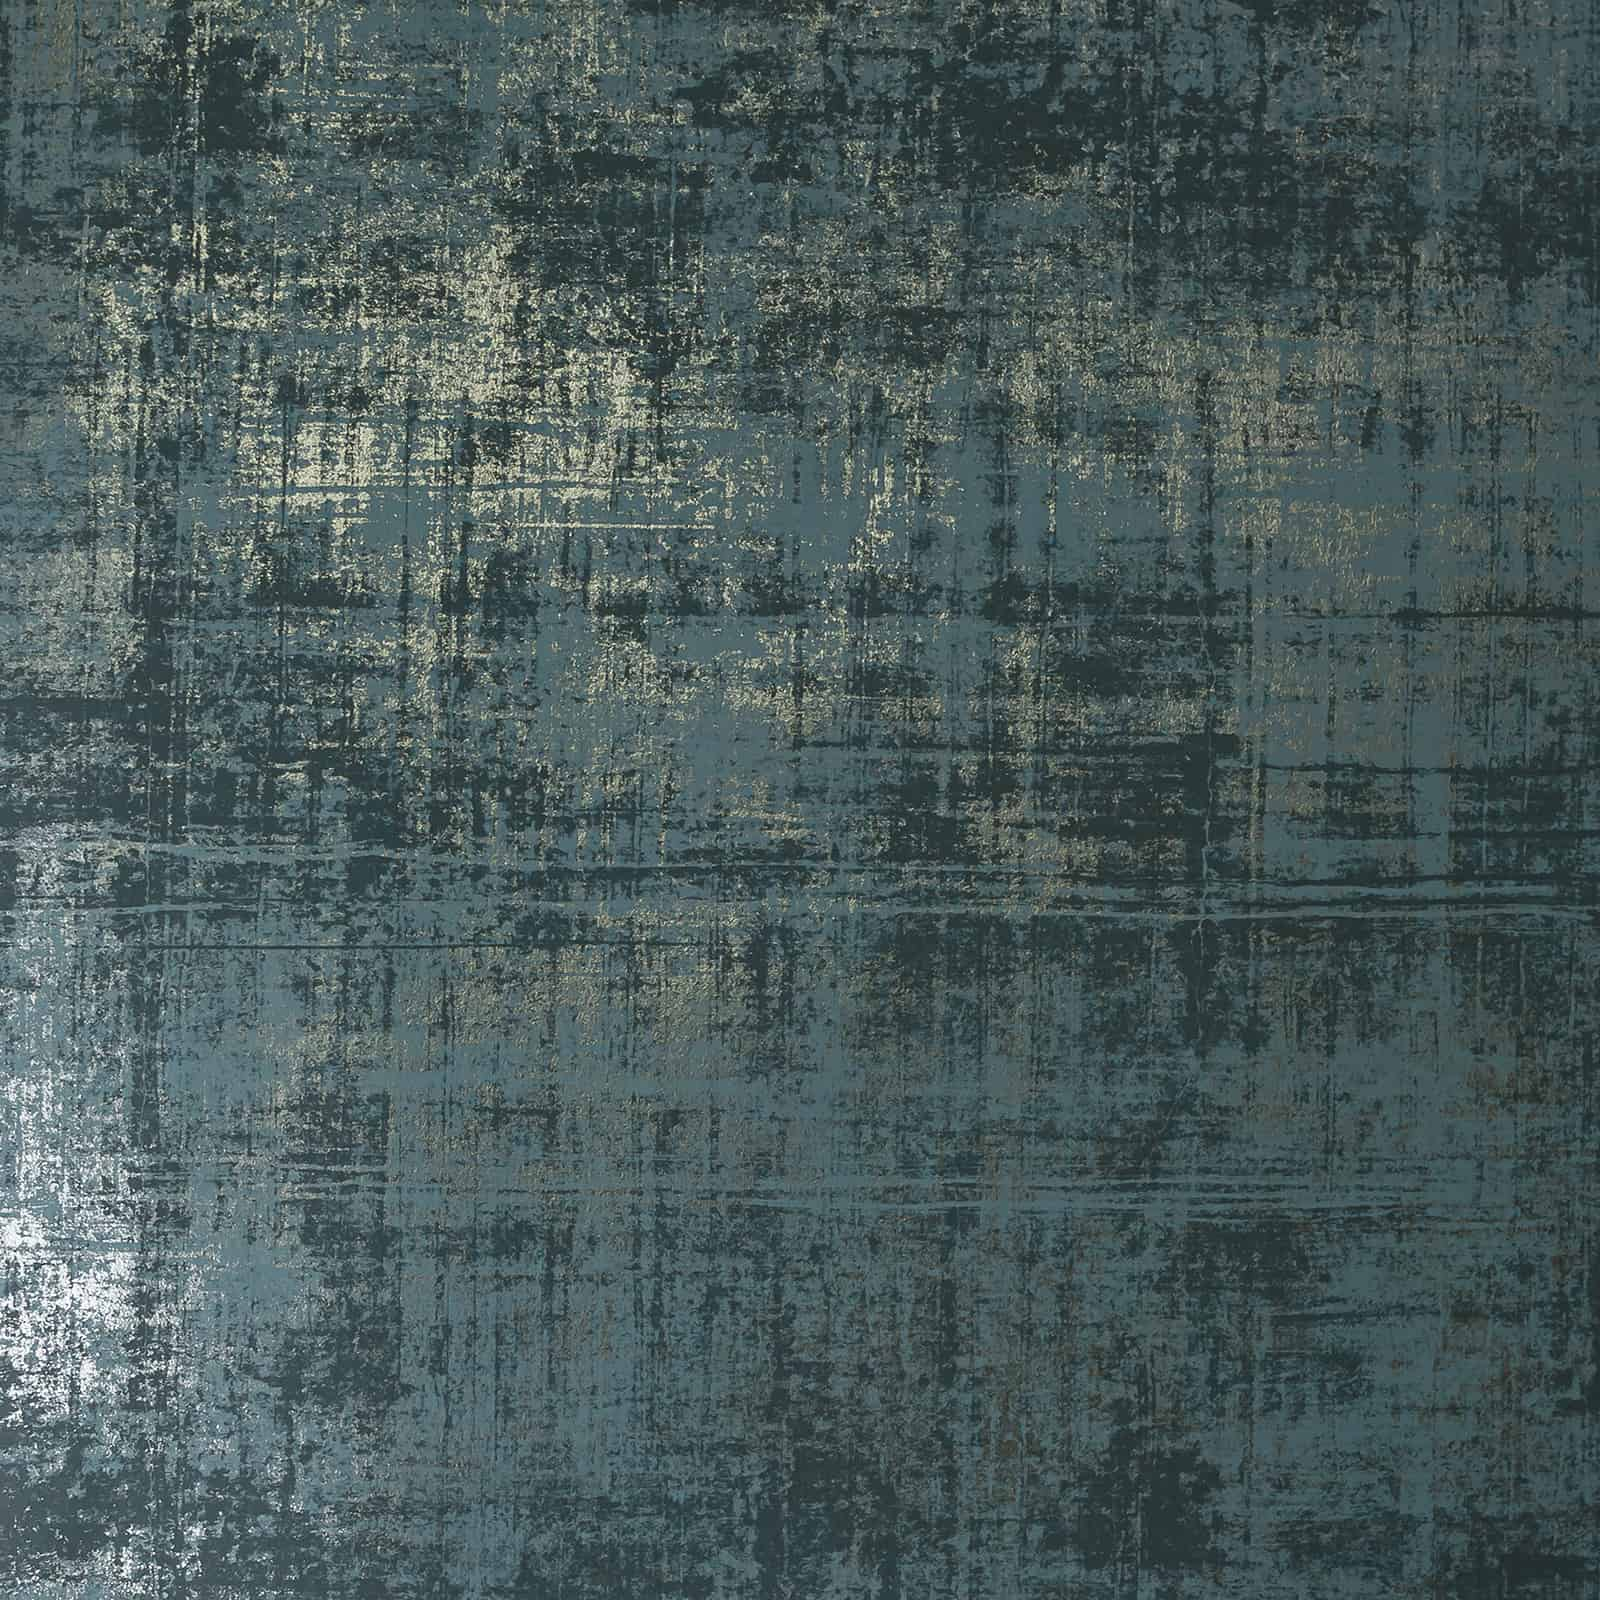 Turquoise-MYLAR